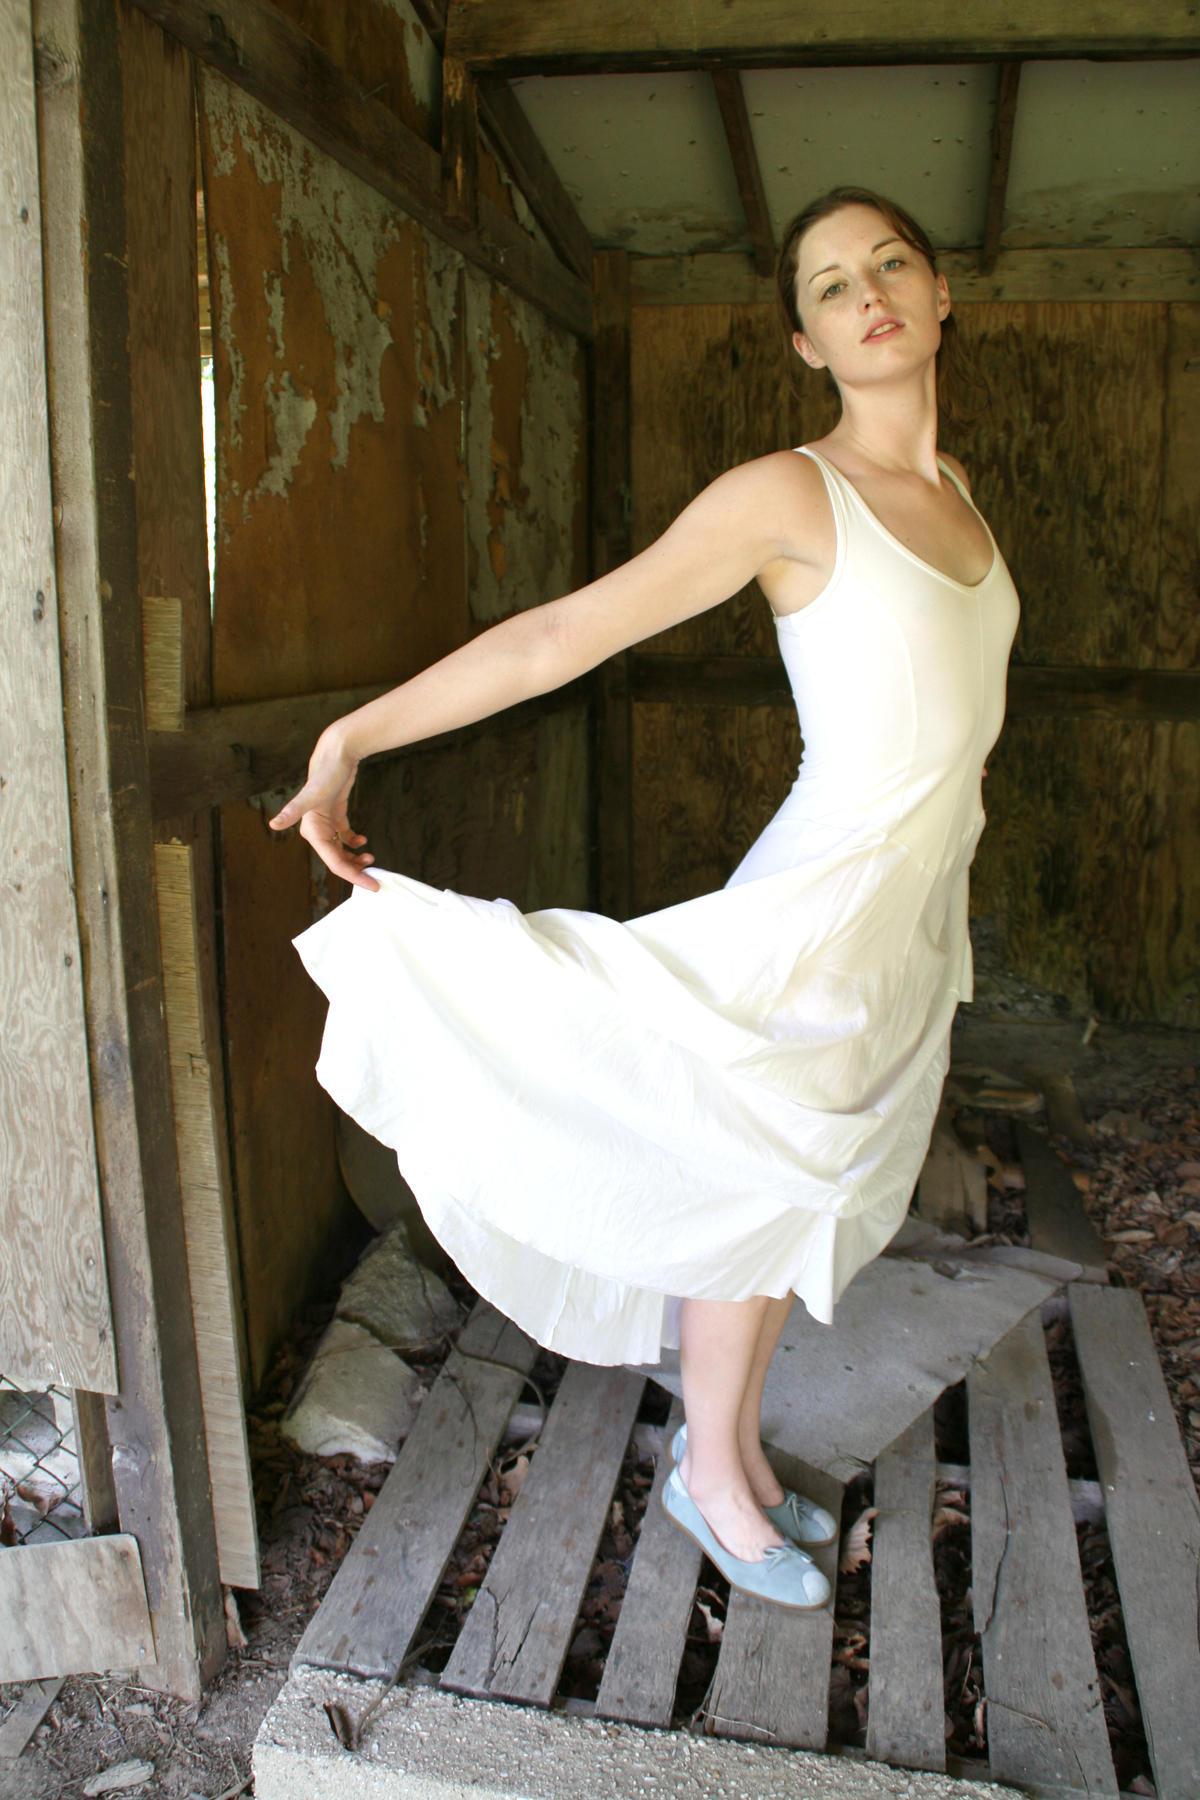 White dress1 by beanstalk